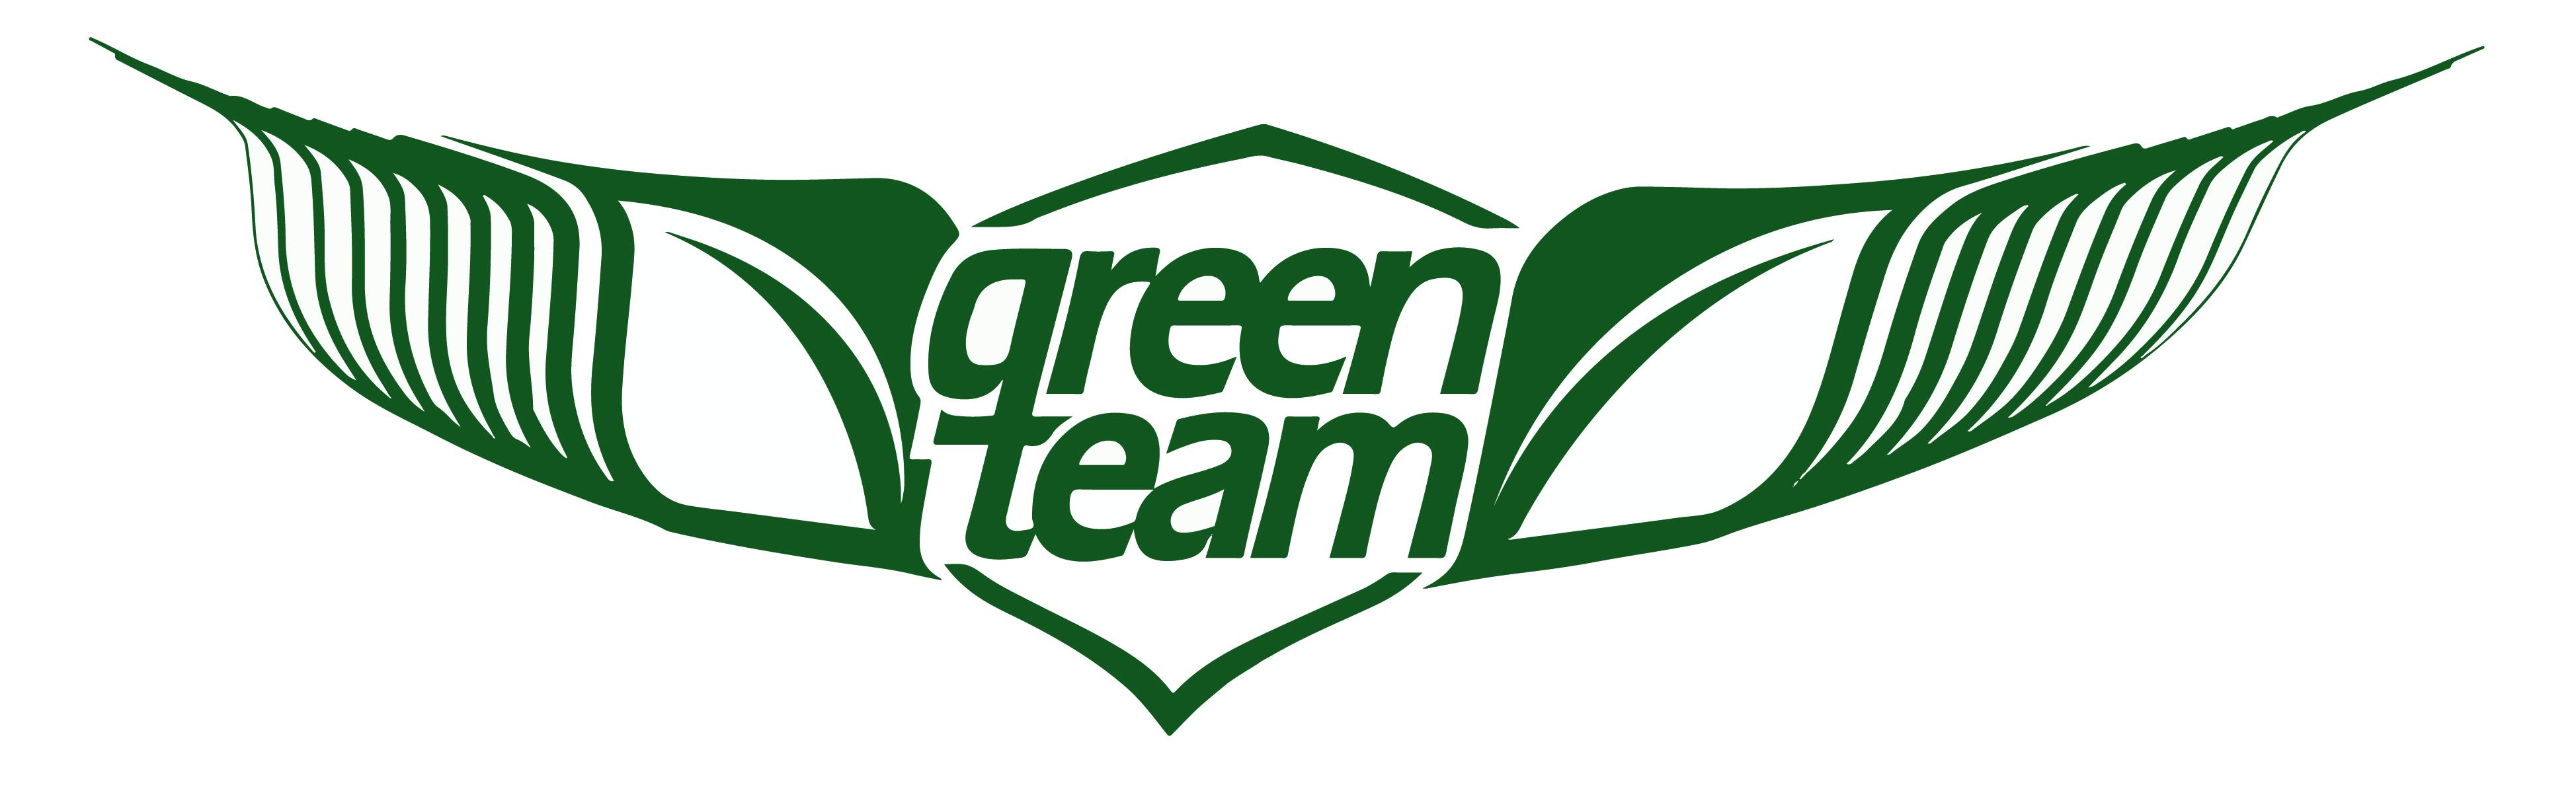 GreenTeamLogoNOTagline-03.jpg